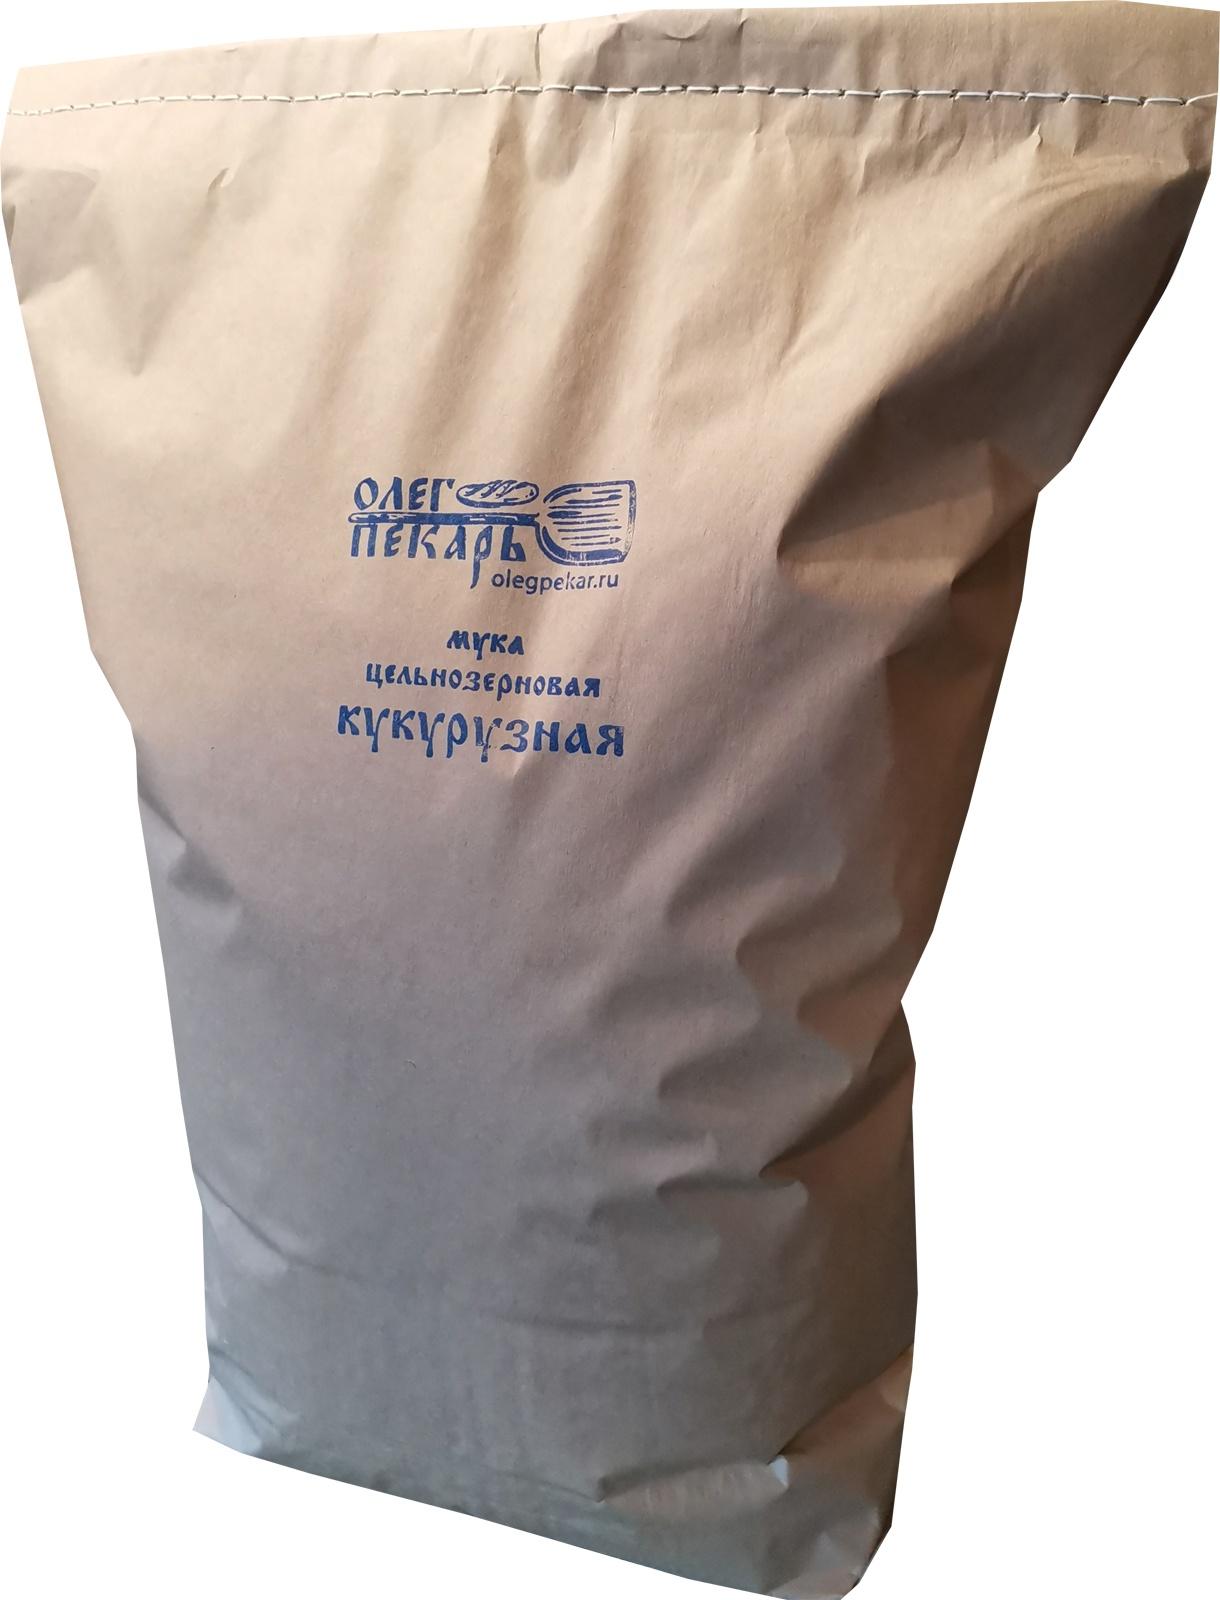 Мука цельнозерновая кукурузы, 10 кг пудовъ мука пшеничная обойная цельнозерновая 1 кг